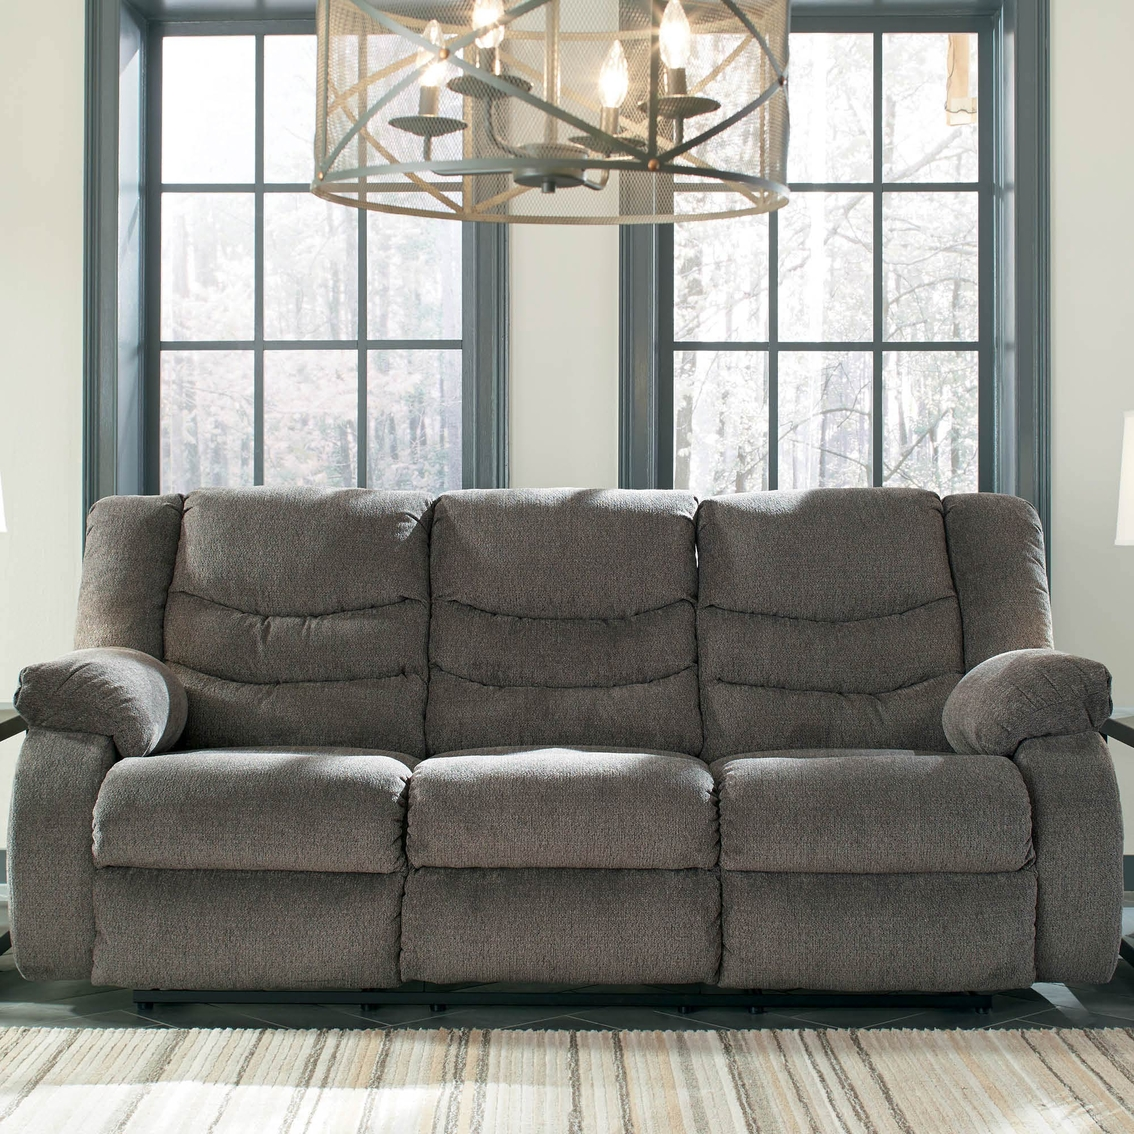 Ashley Furniture Closeout: Ashley Tulen Reclining Sofa